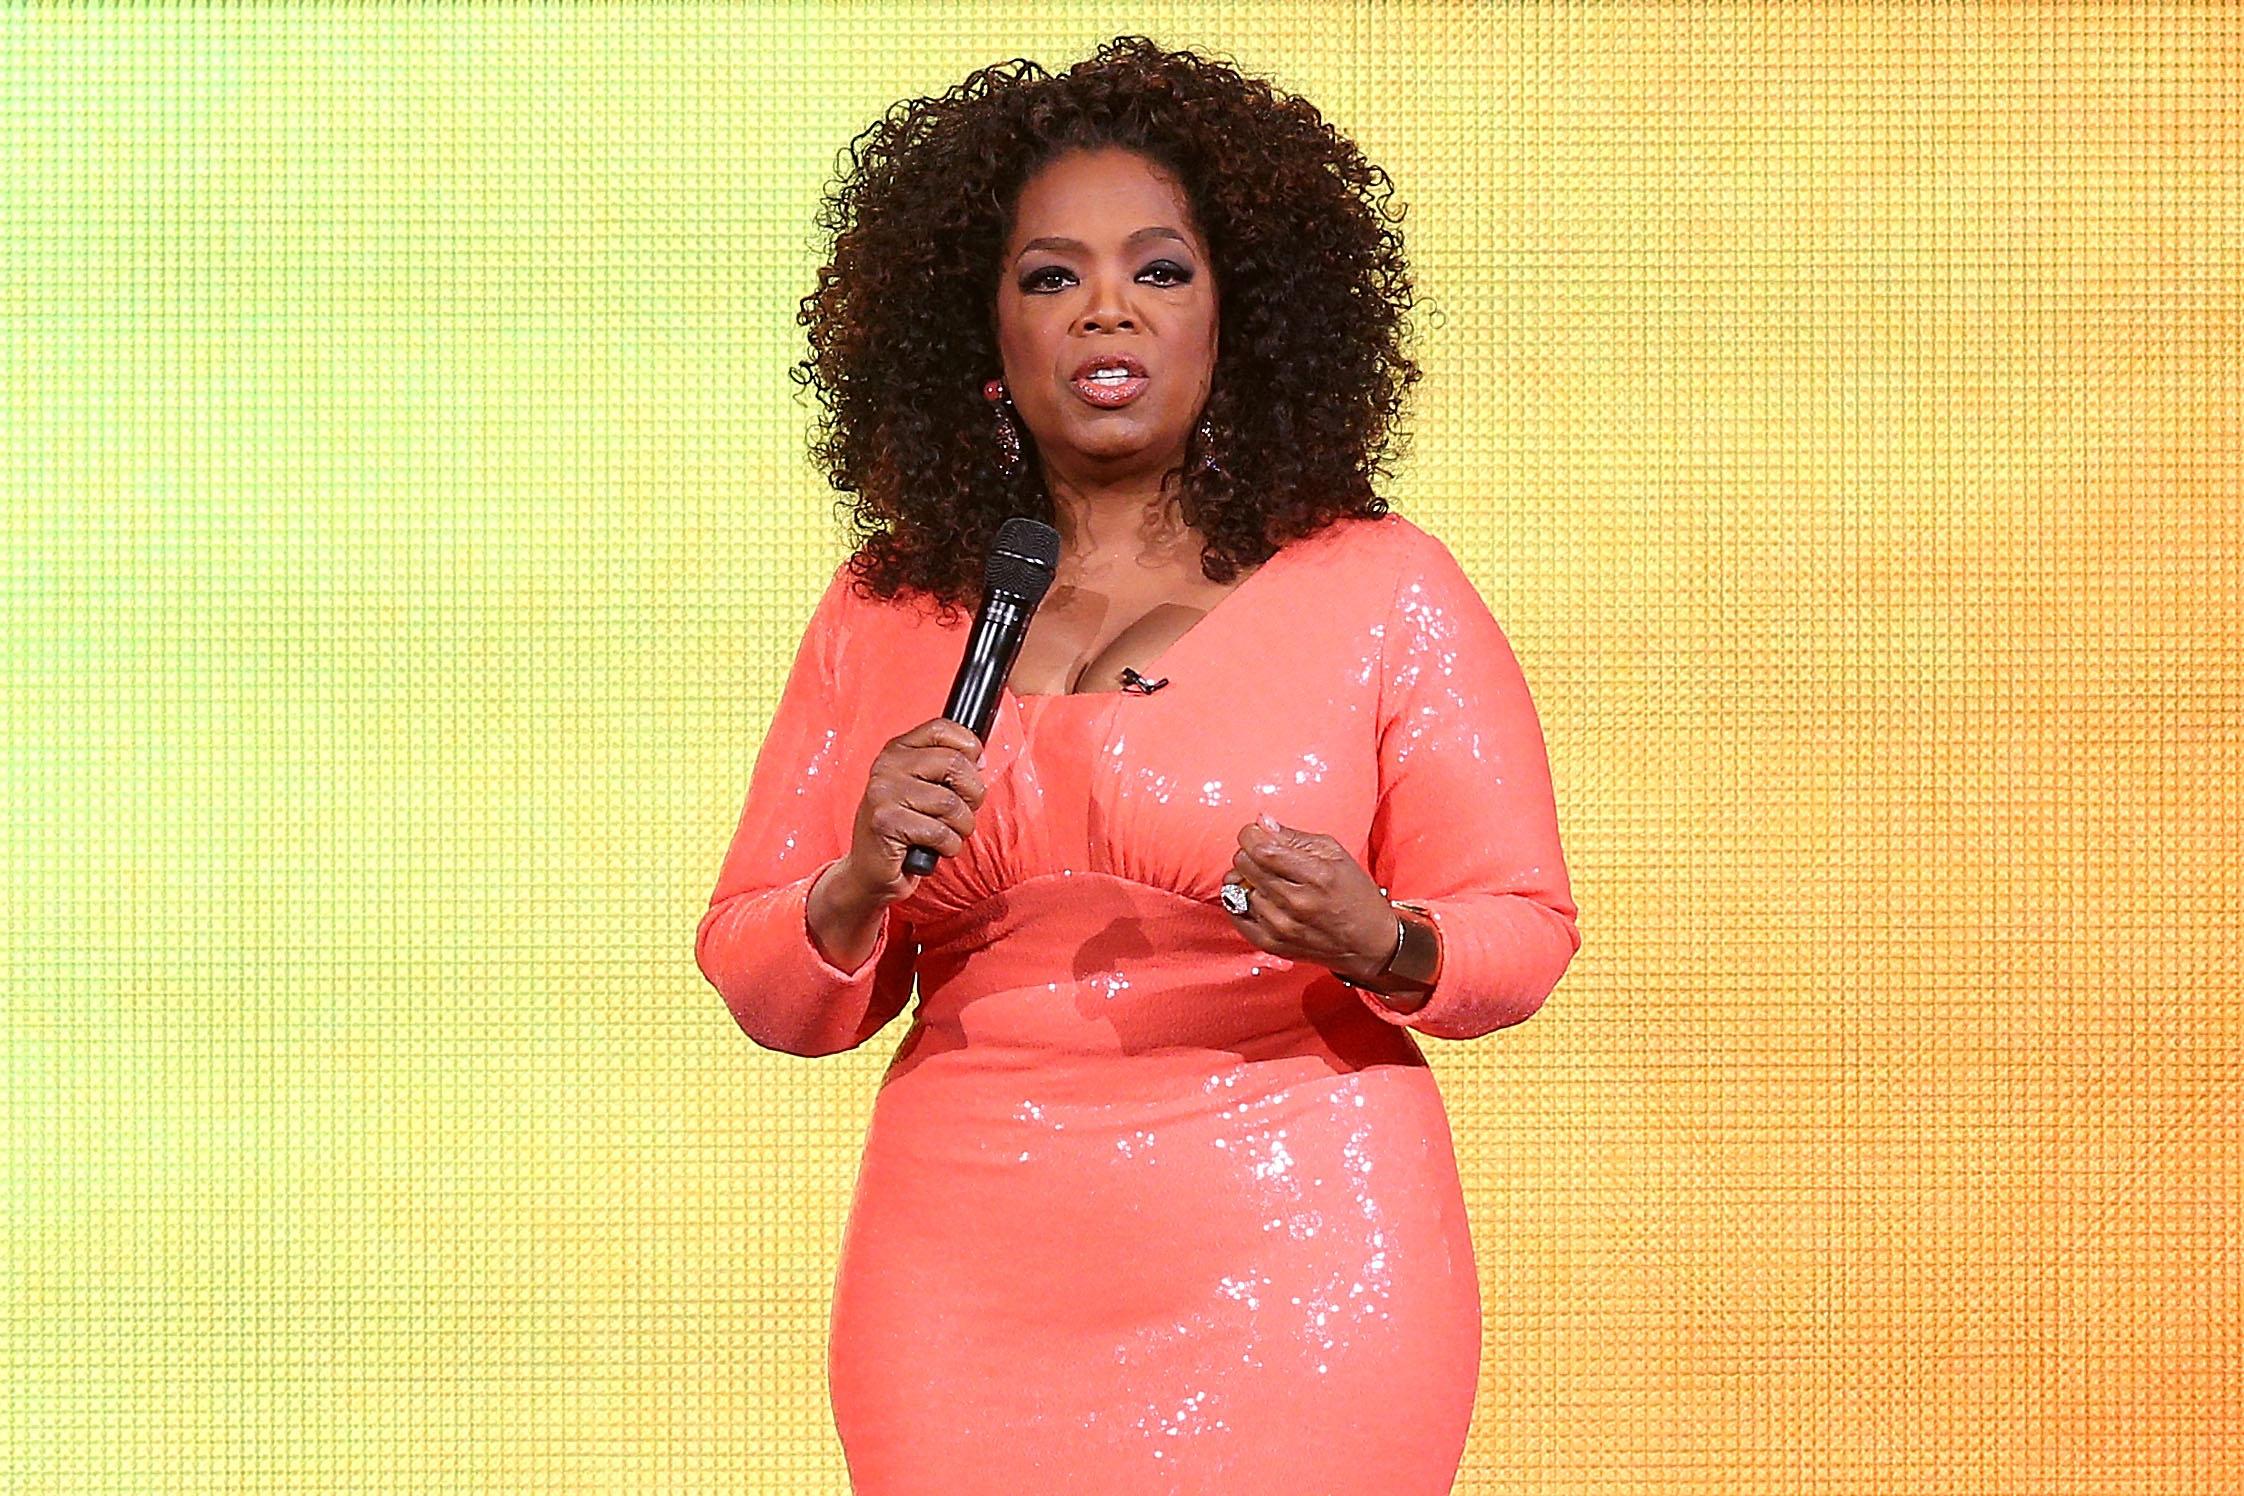 Oprah Winfrey talks on stage during her An Evening With Oprah tour on December 2, 2015 in Melbourne, Australia.